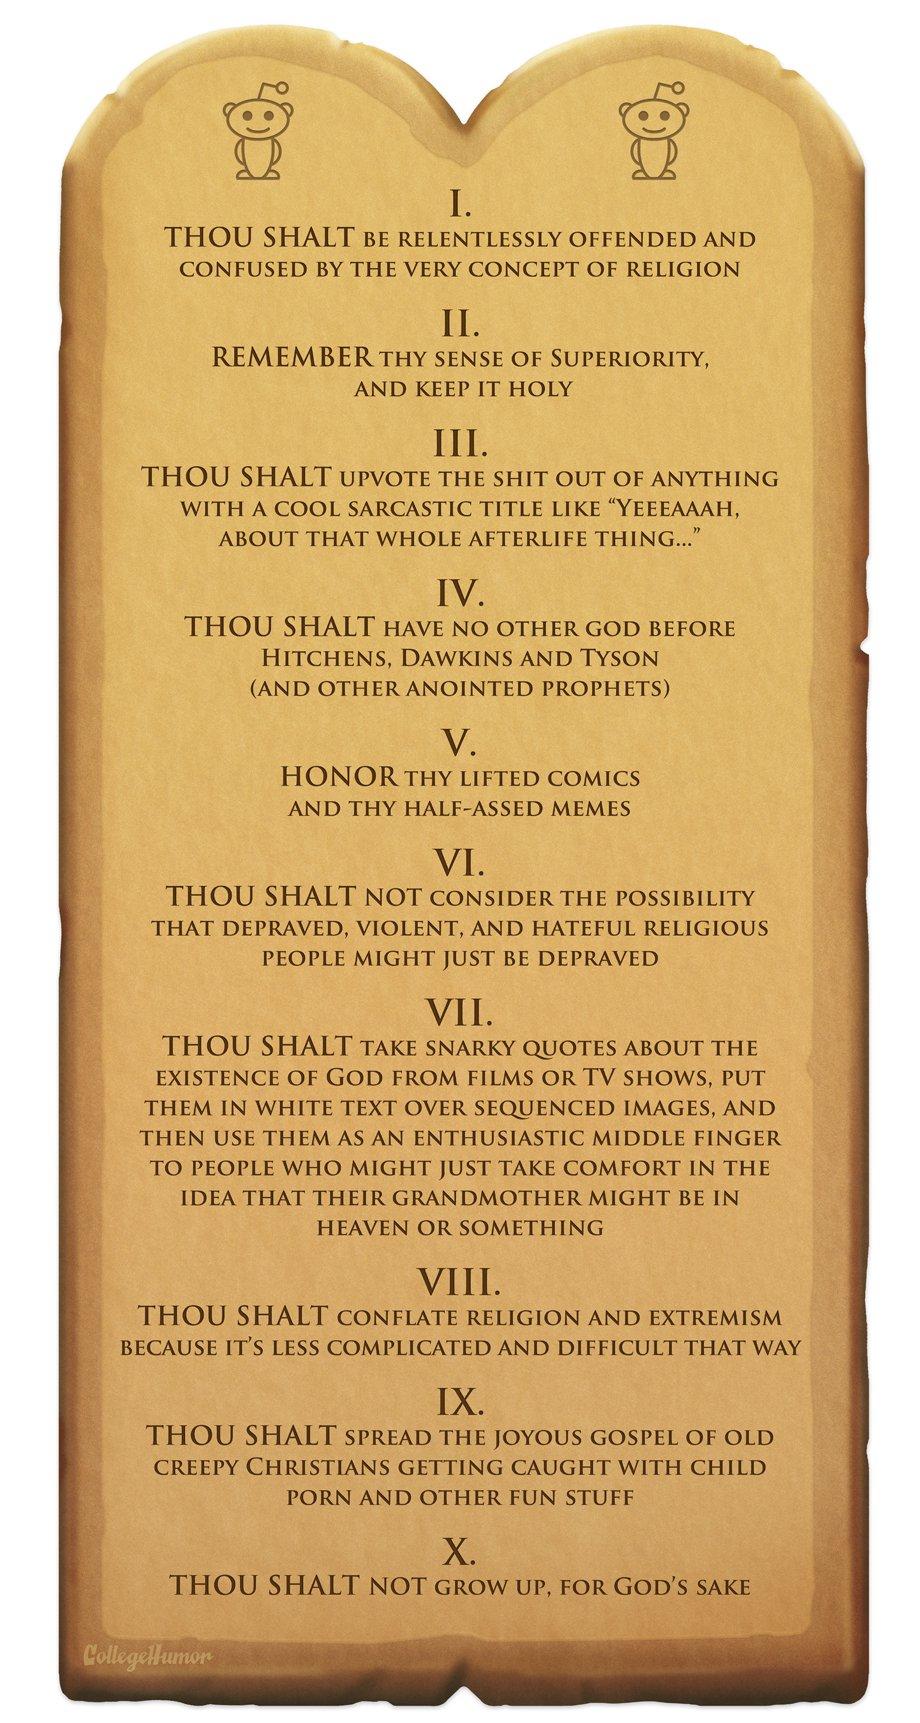 46ae5b481473b7292f7499ddd89a3f31-the-ten-commandments-of-reddits-ratheism